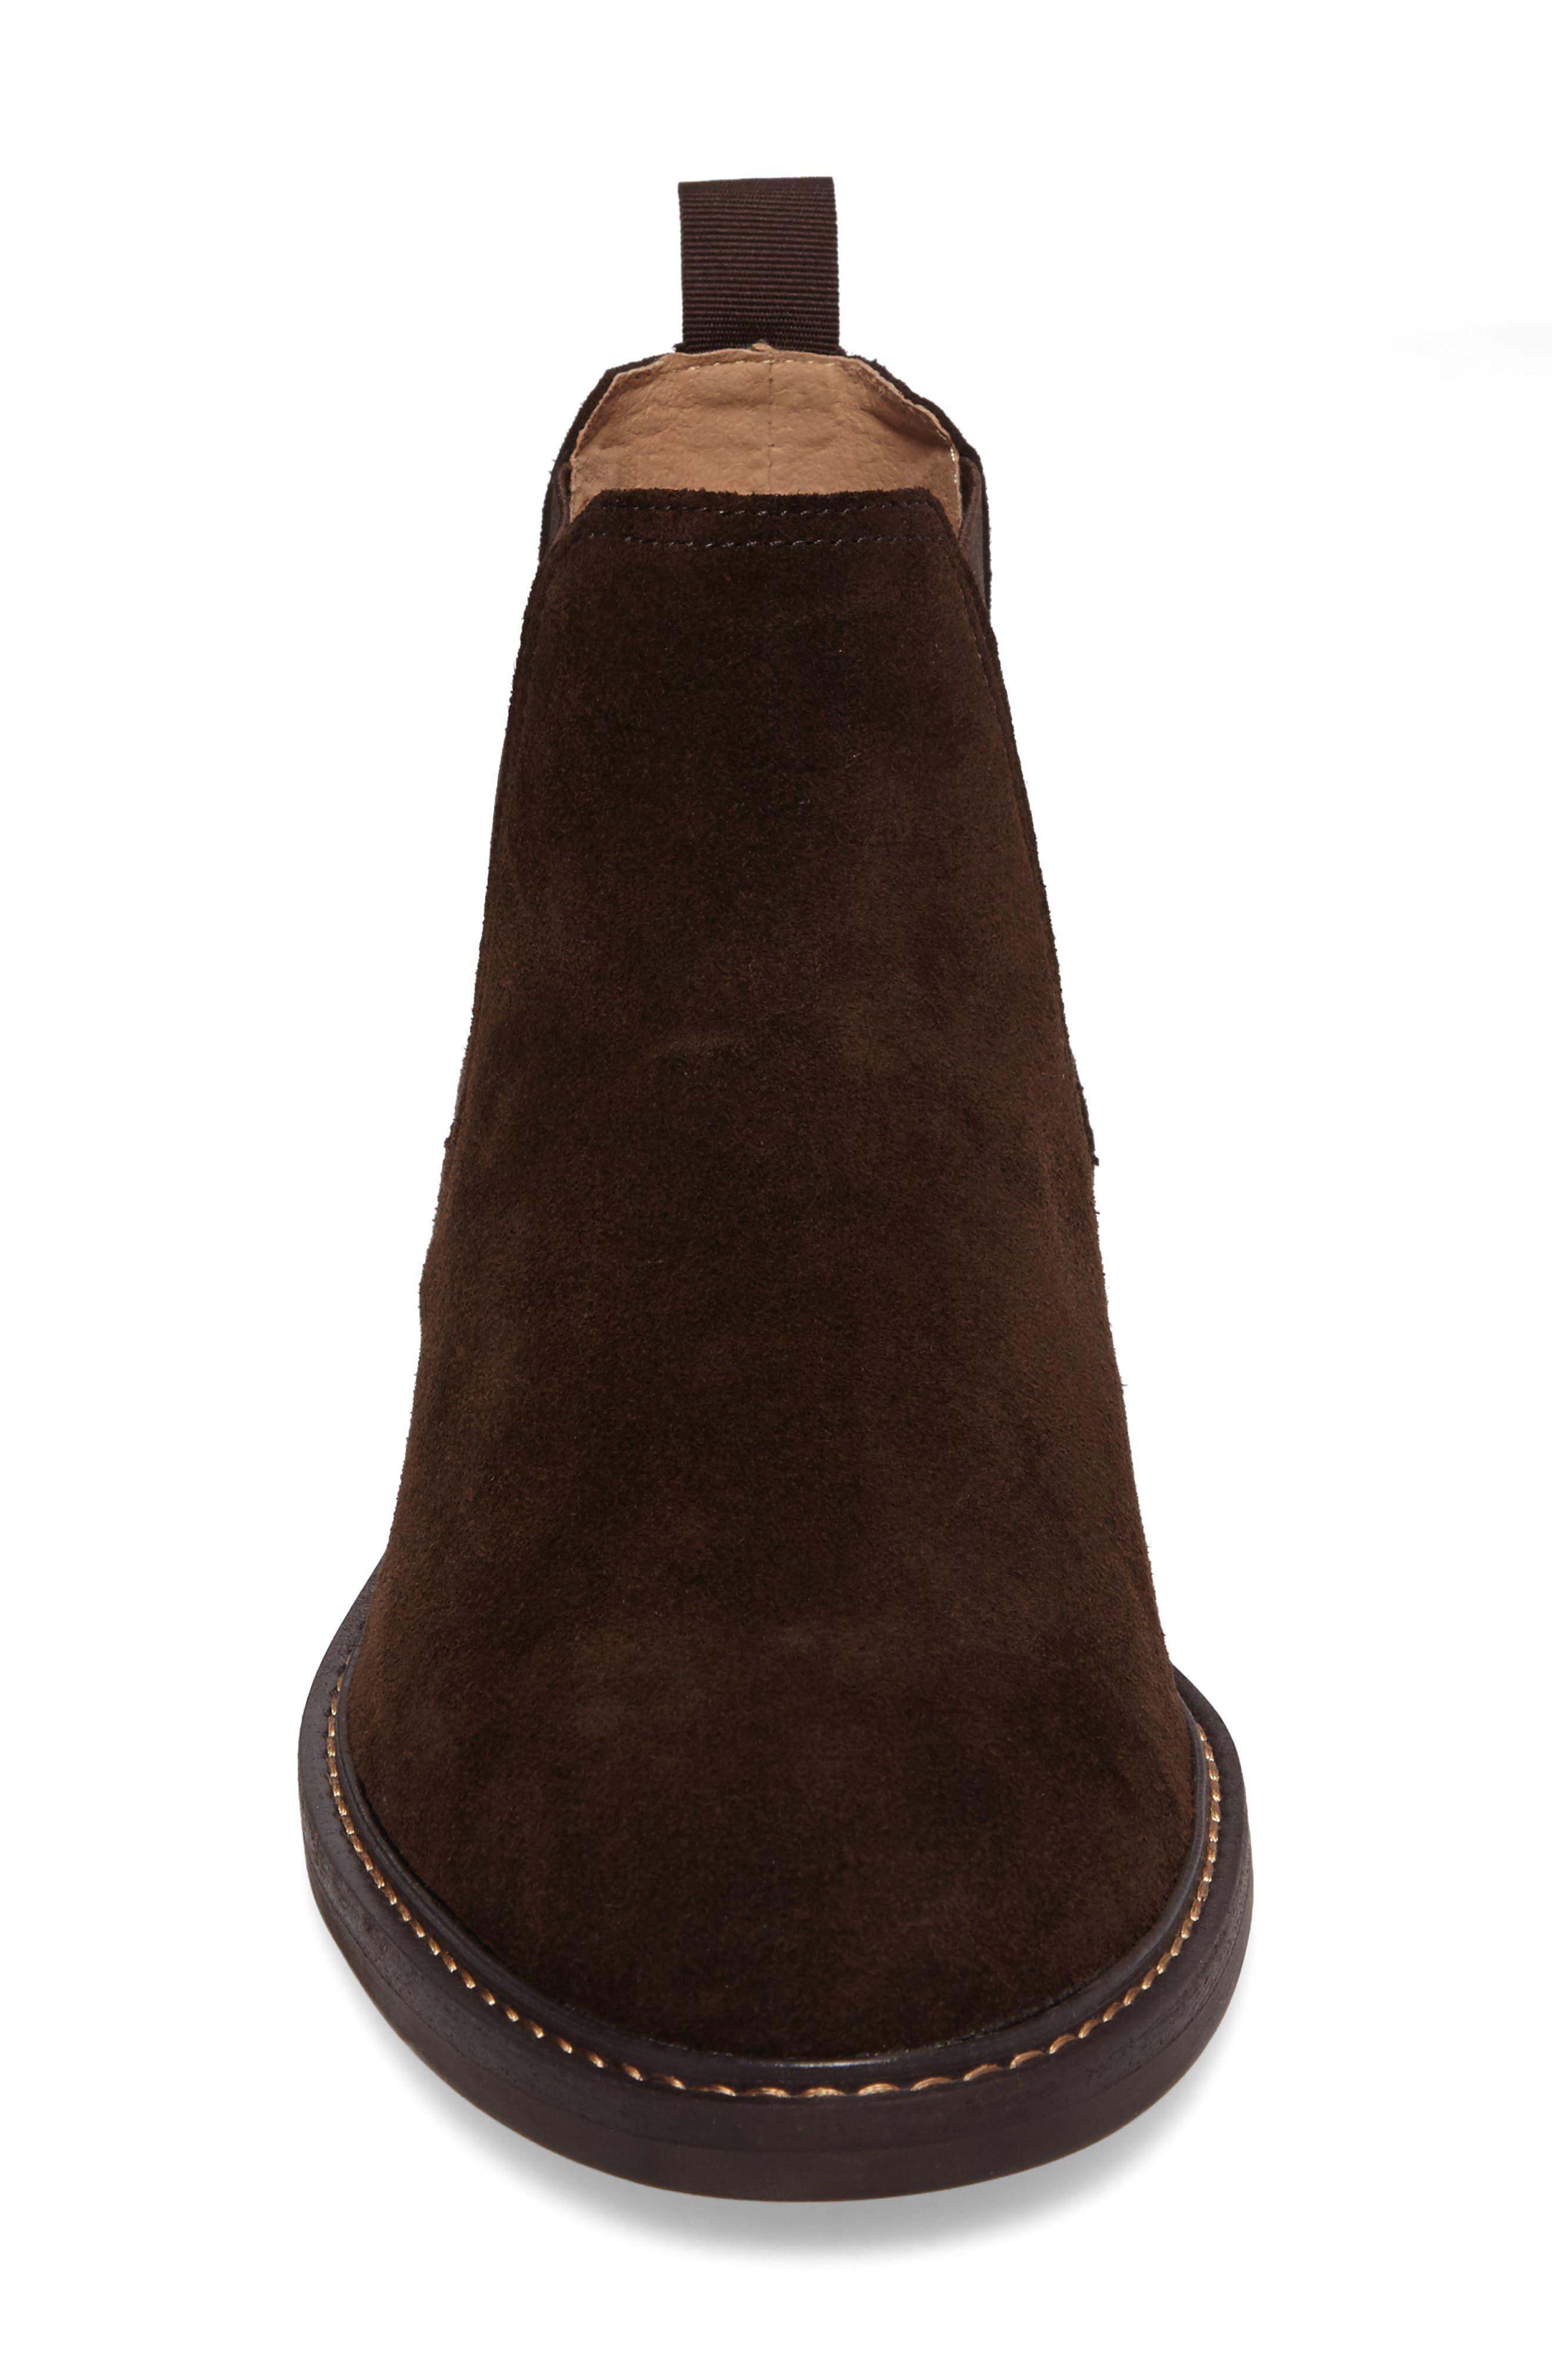 Horton Chelsea Boot,                             Alternate thumbnail 37, color,